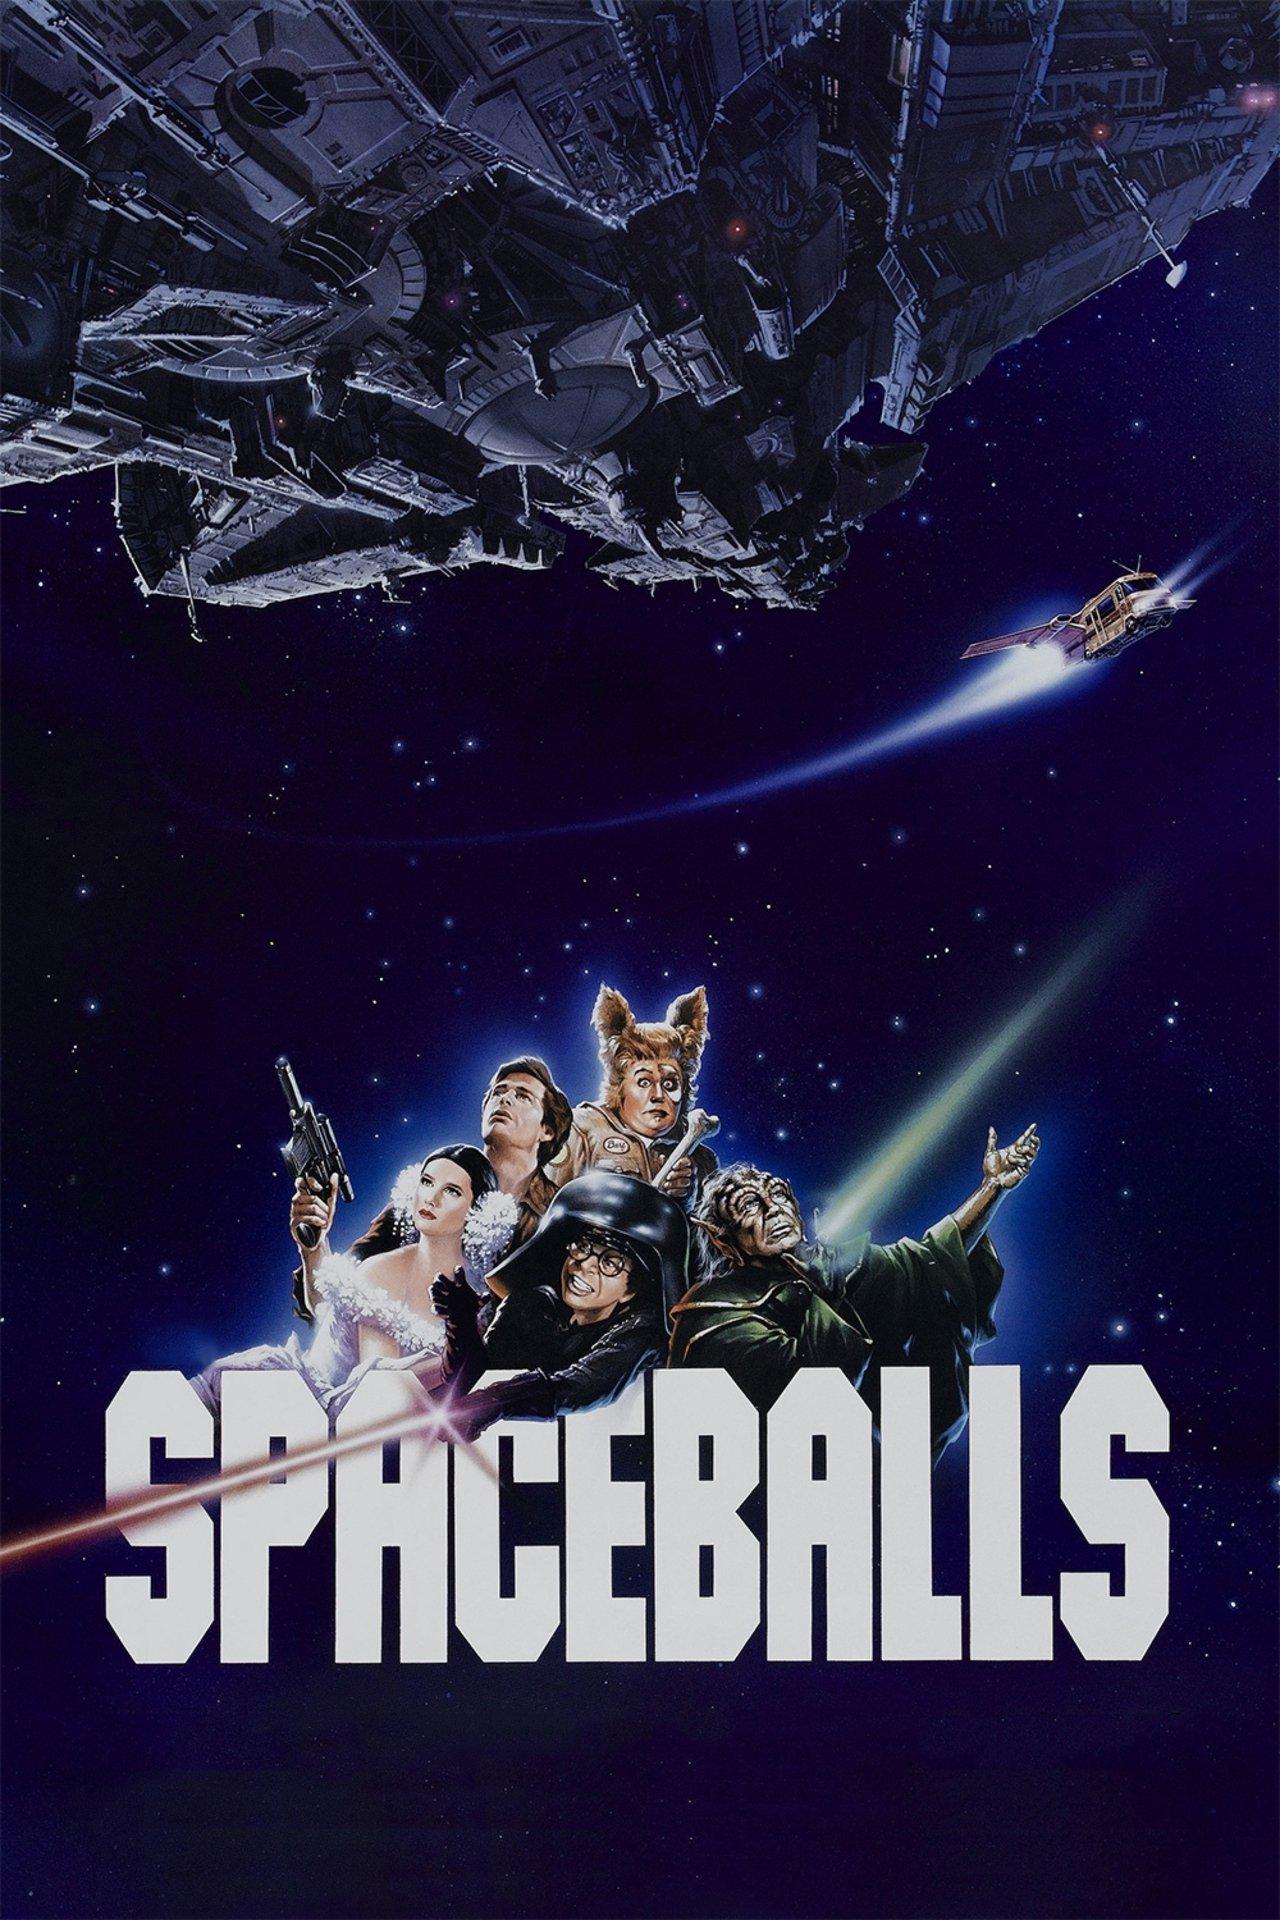 Poster for Spaceballs